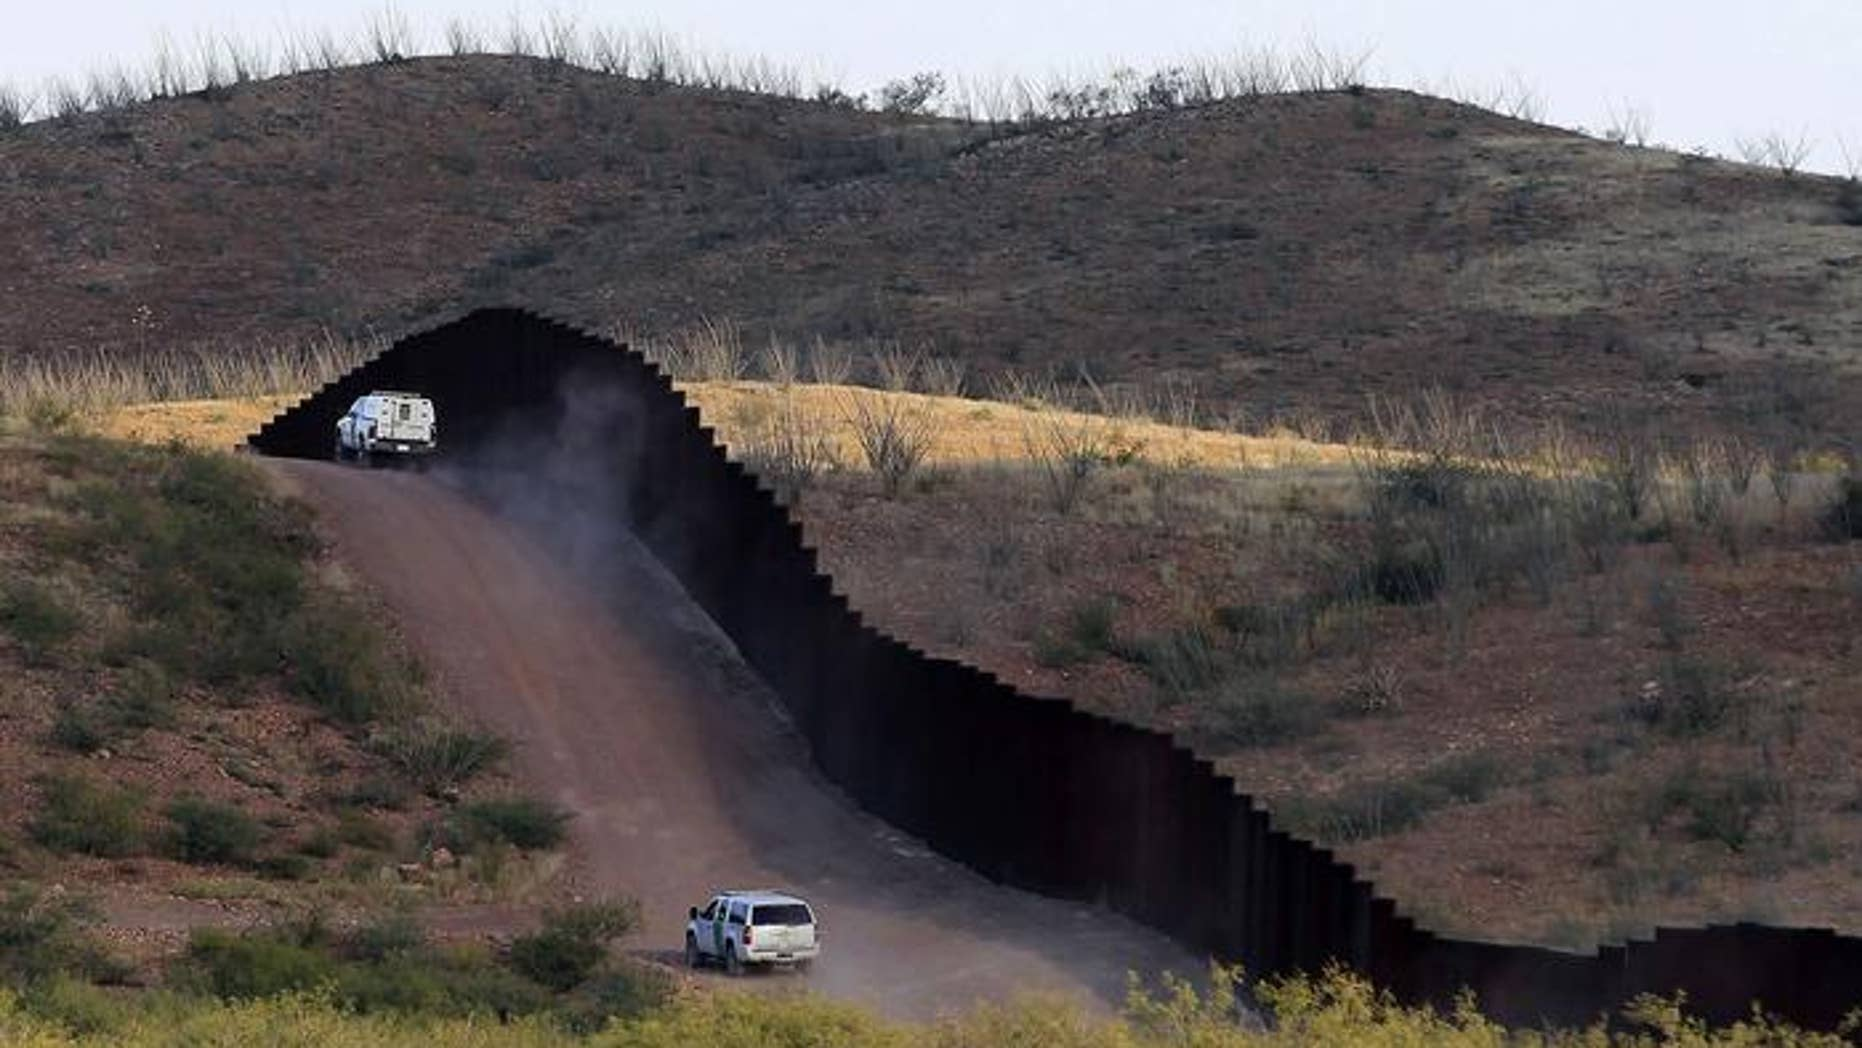 U.S. Border Patrol agents patrolling the border fence near Naco, Ariz.